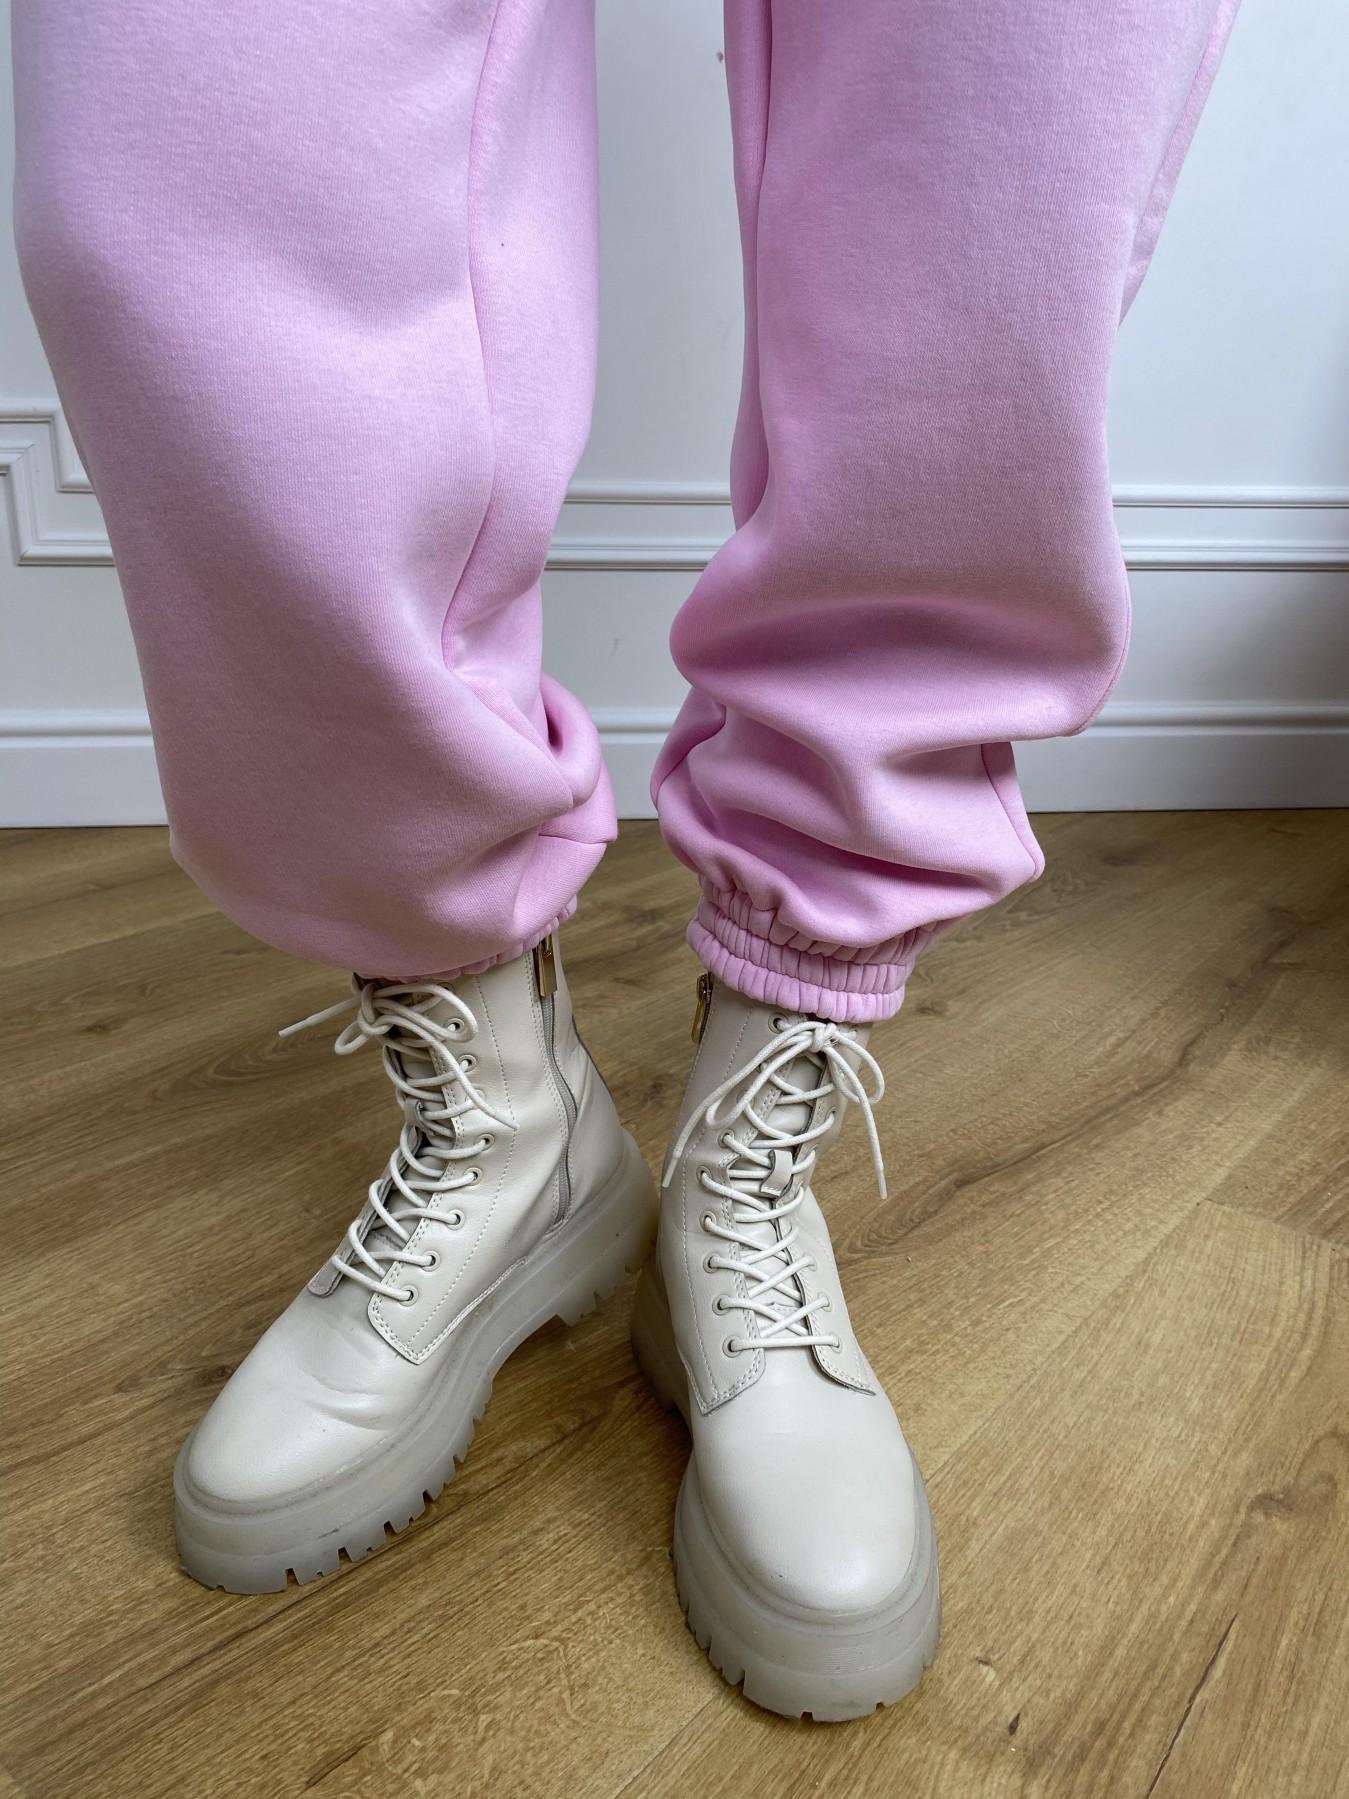 Марион костюм в  стиле Oversize  3х нитка 9651 АРТ. 46922 Цвет: Розовый - фото 8, интернет магазин tm-modus.ru